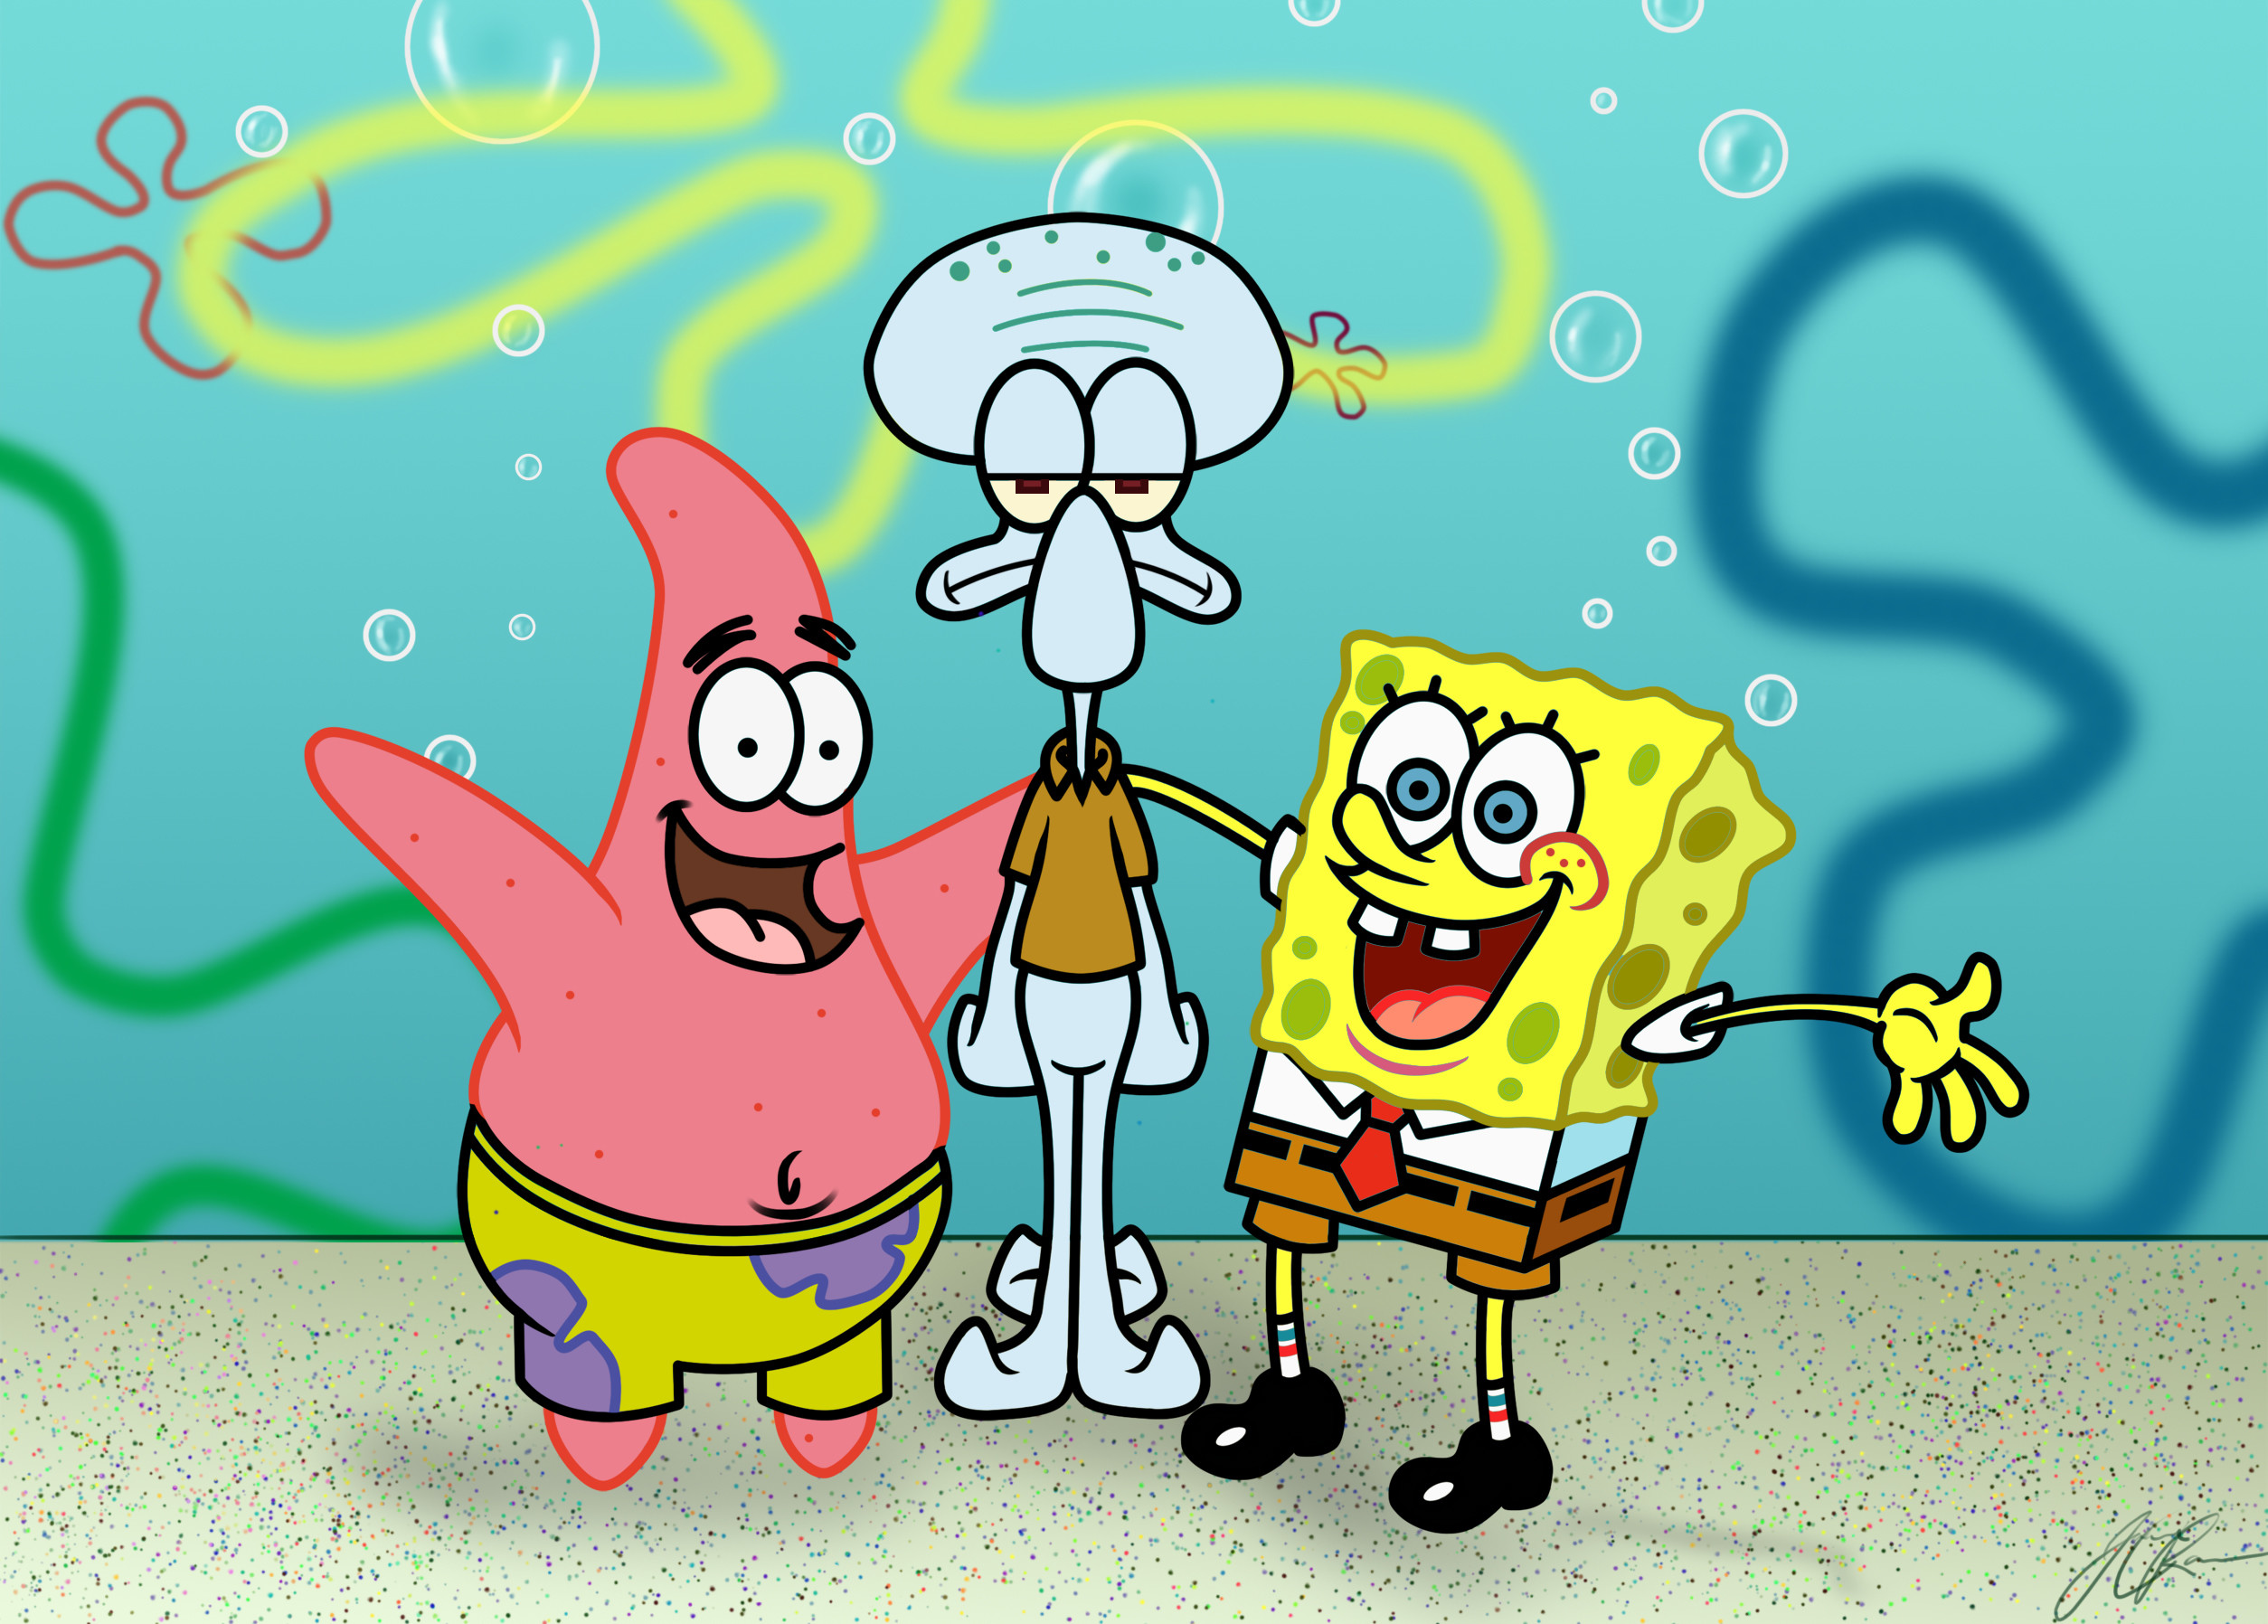 Download this Wallpaper Cartoon Spongebob The Squarepants Wiki picture